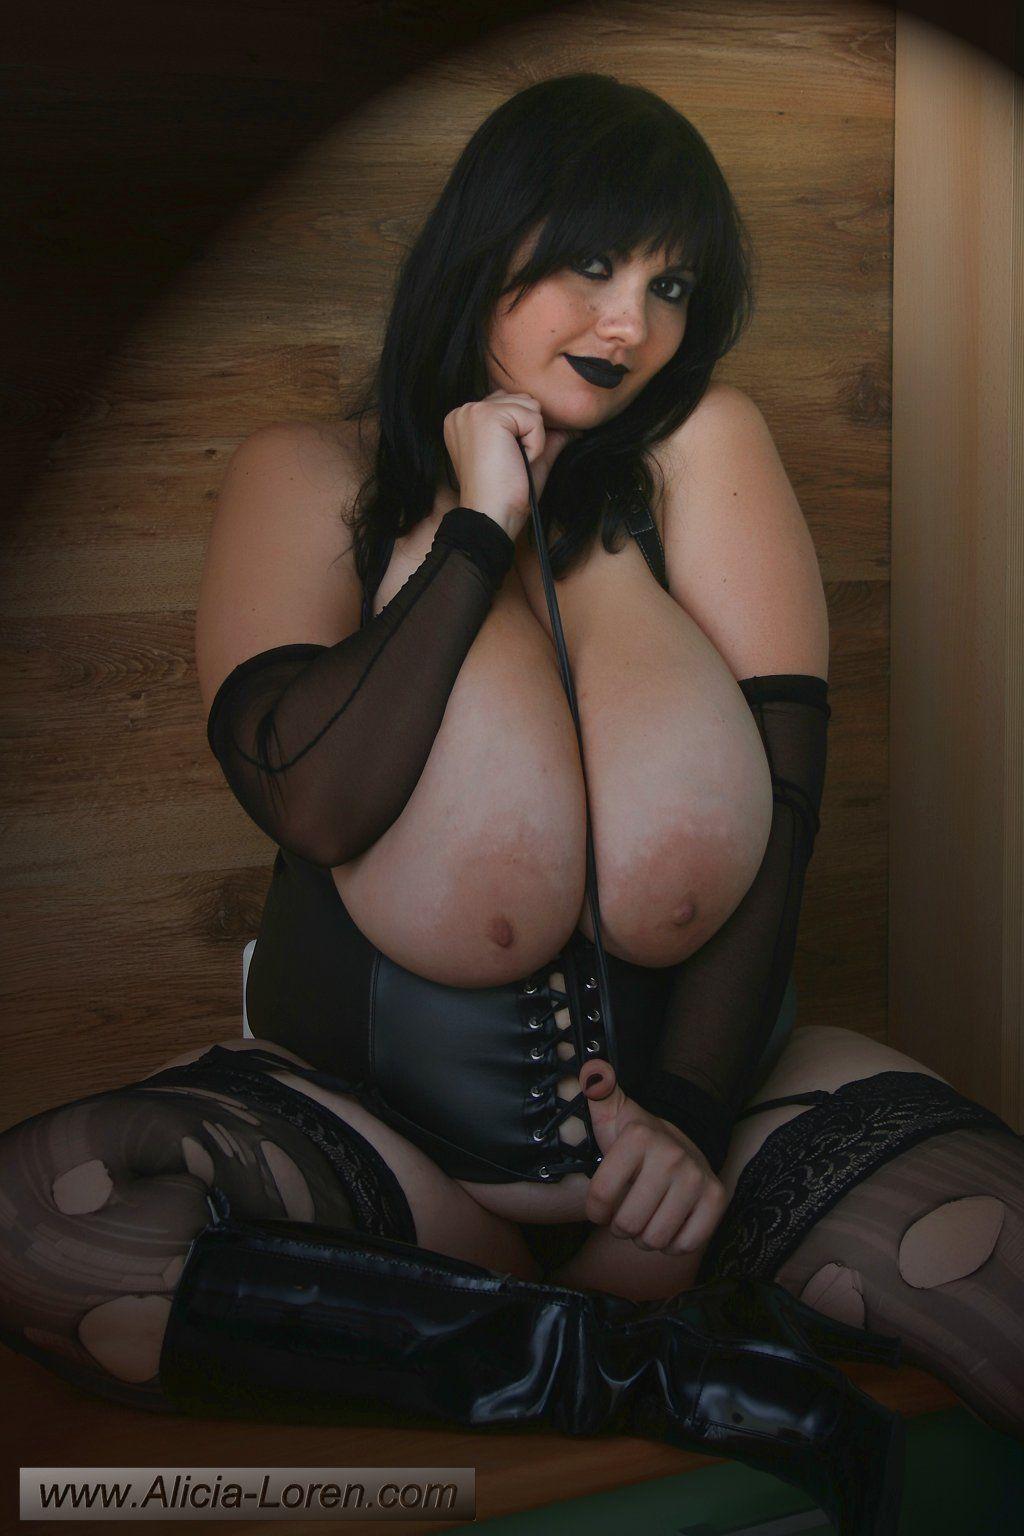 madagascar hot girls pussy